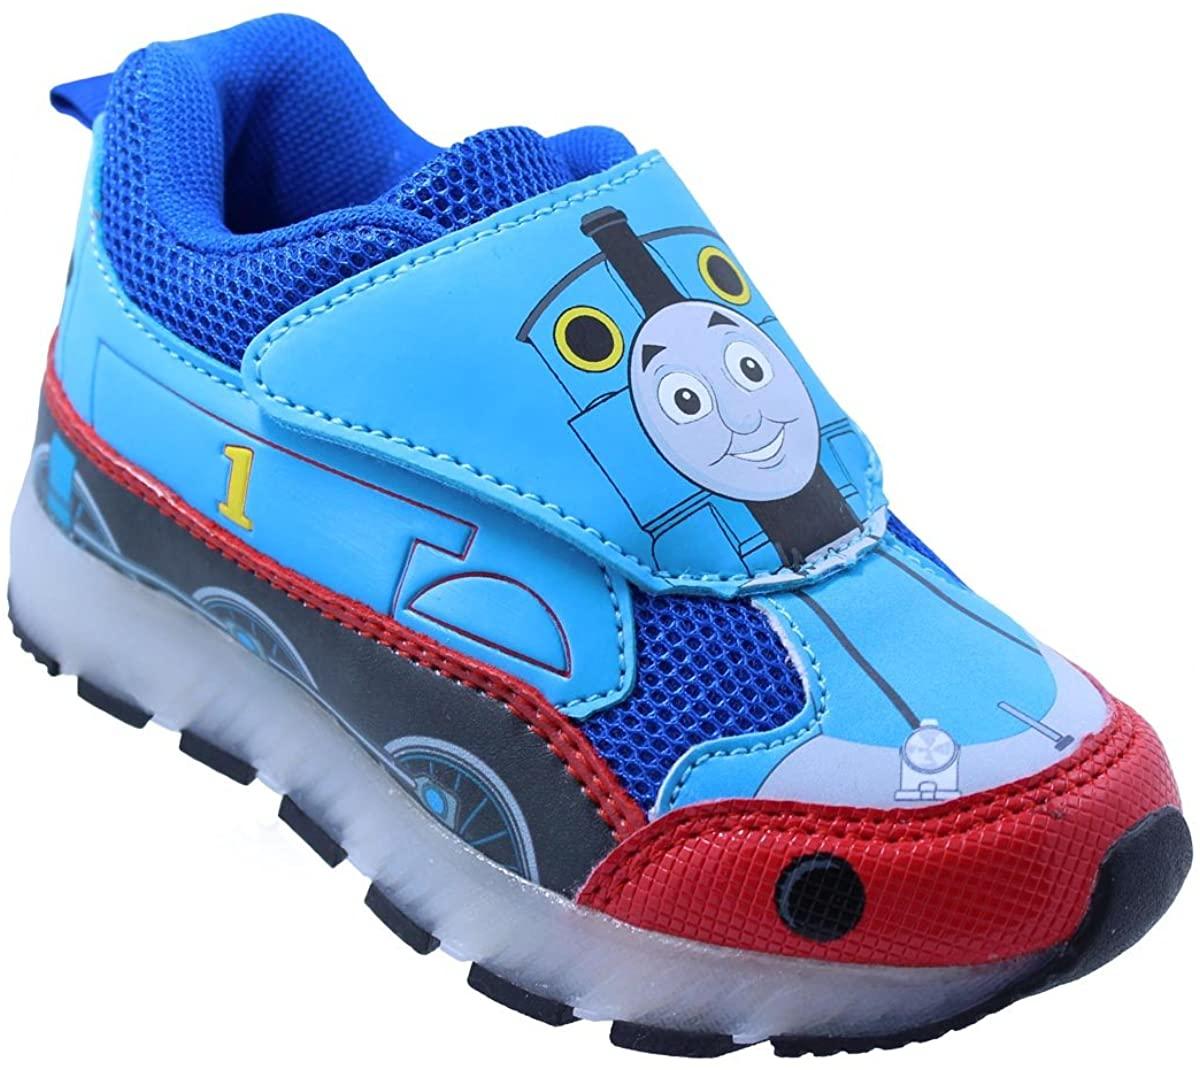 Thomas The Train Toddler Boys' Light-Up Train Athletic Running Shoe Sneaker Blue (8 M US Toddler)